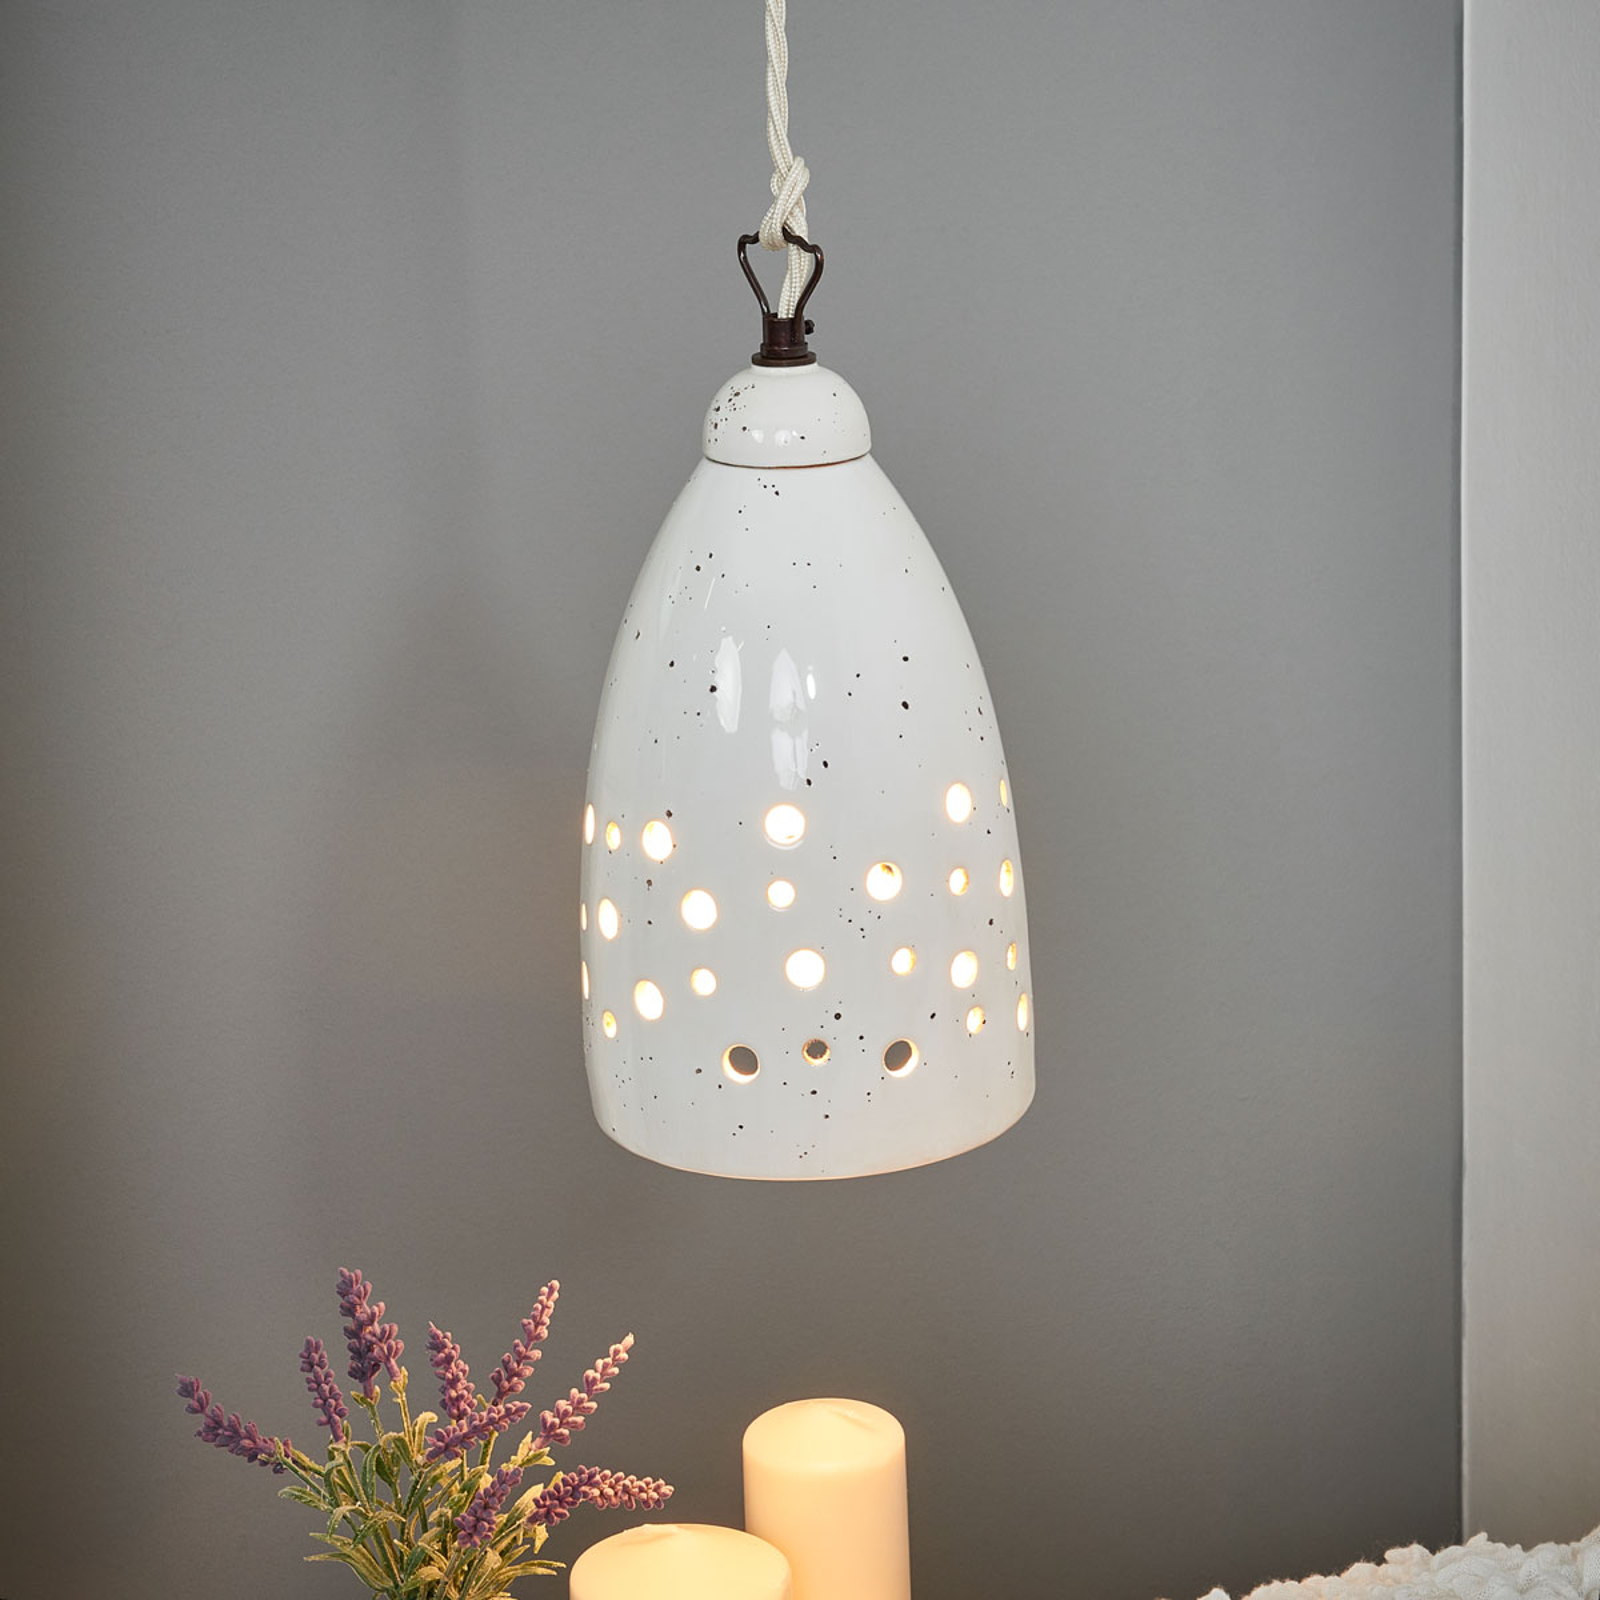 Ceramic hanging light Gisella, downlight_3046245_1